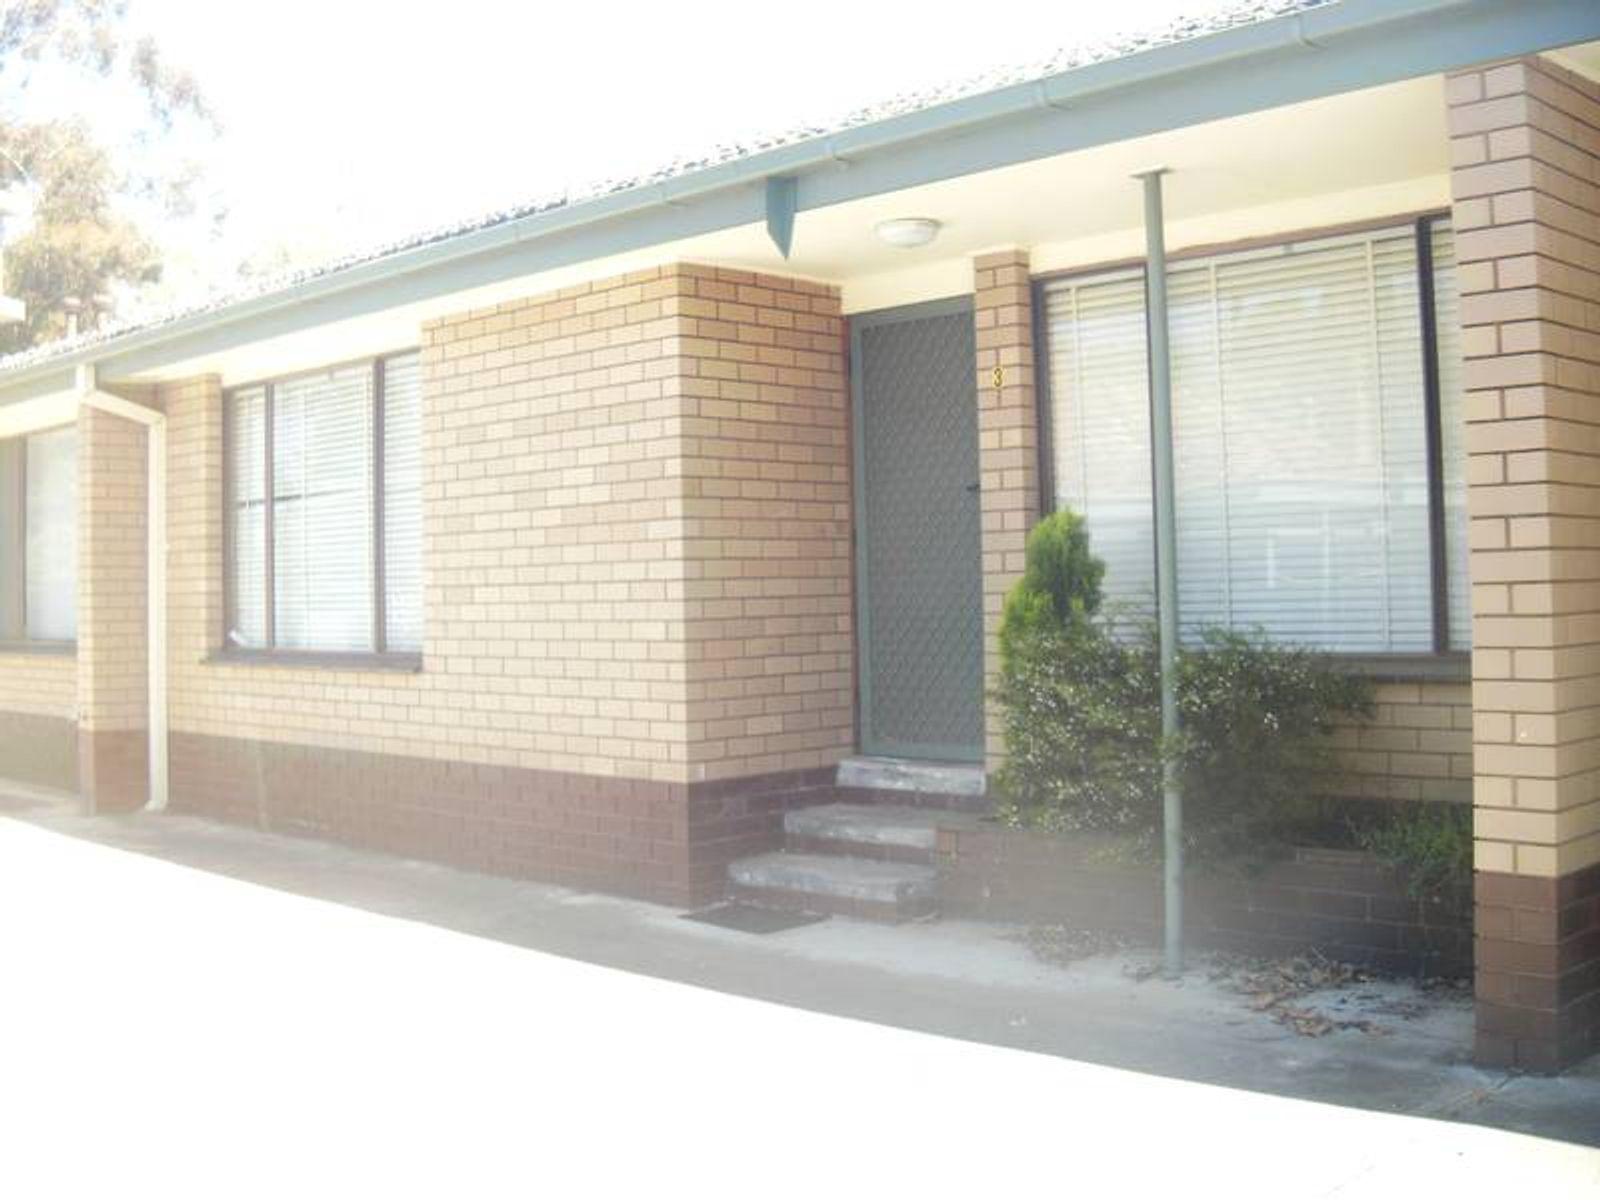 3/24 Honeysuckle Street, Bendigo, VIC 3550